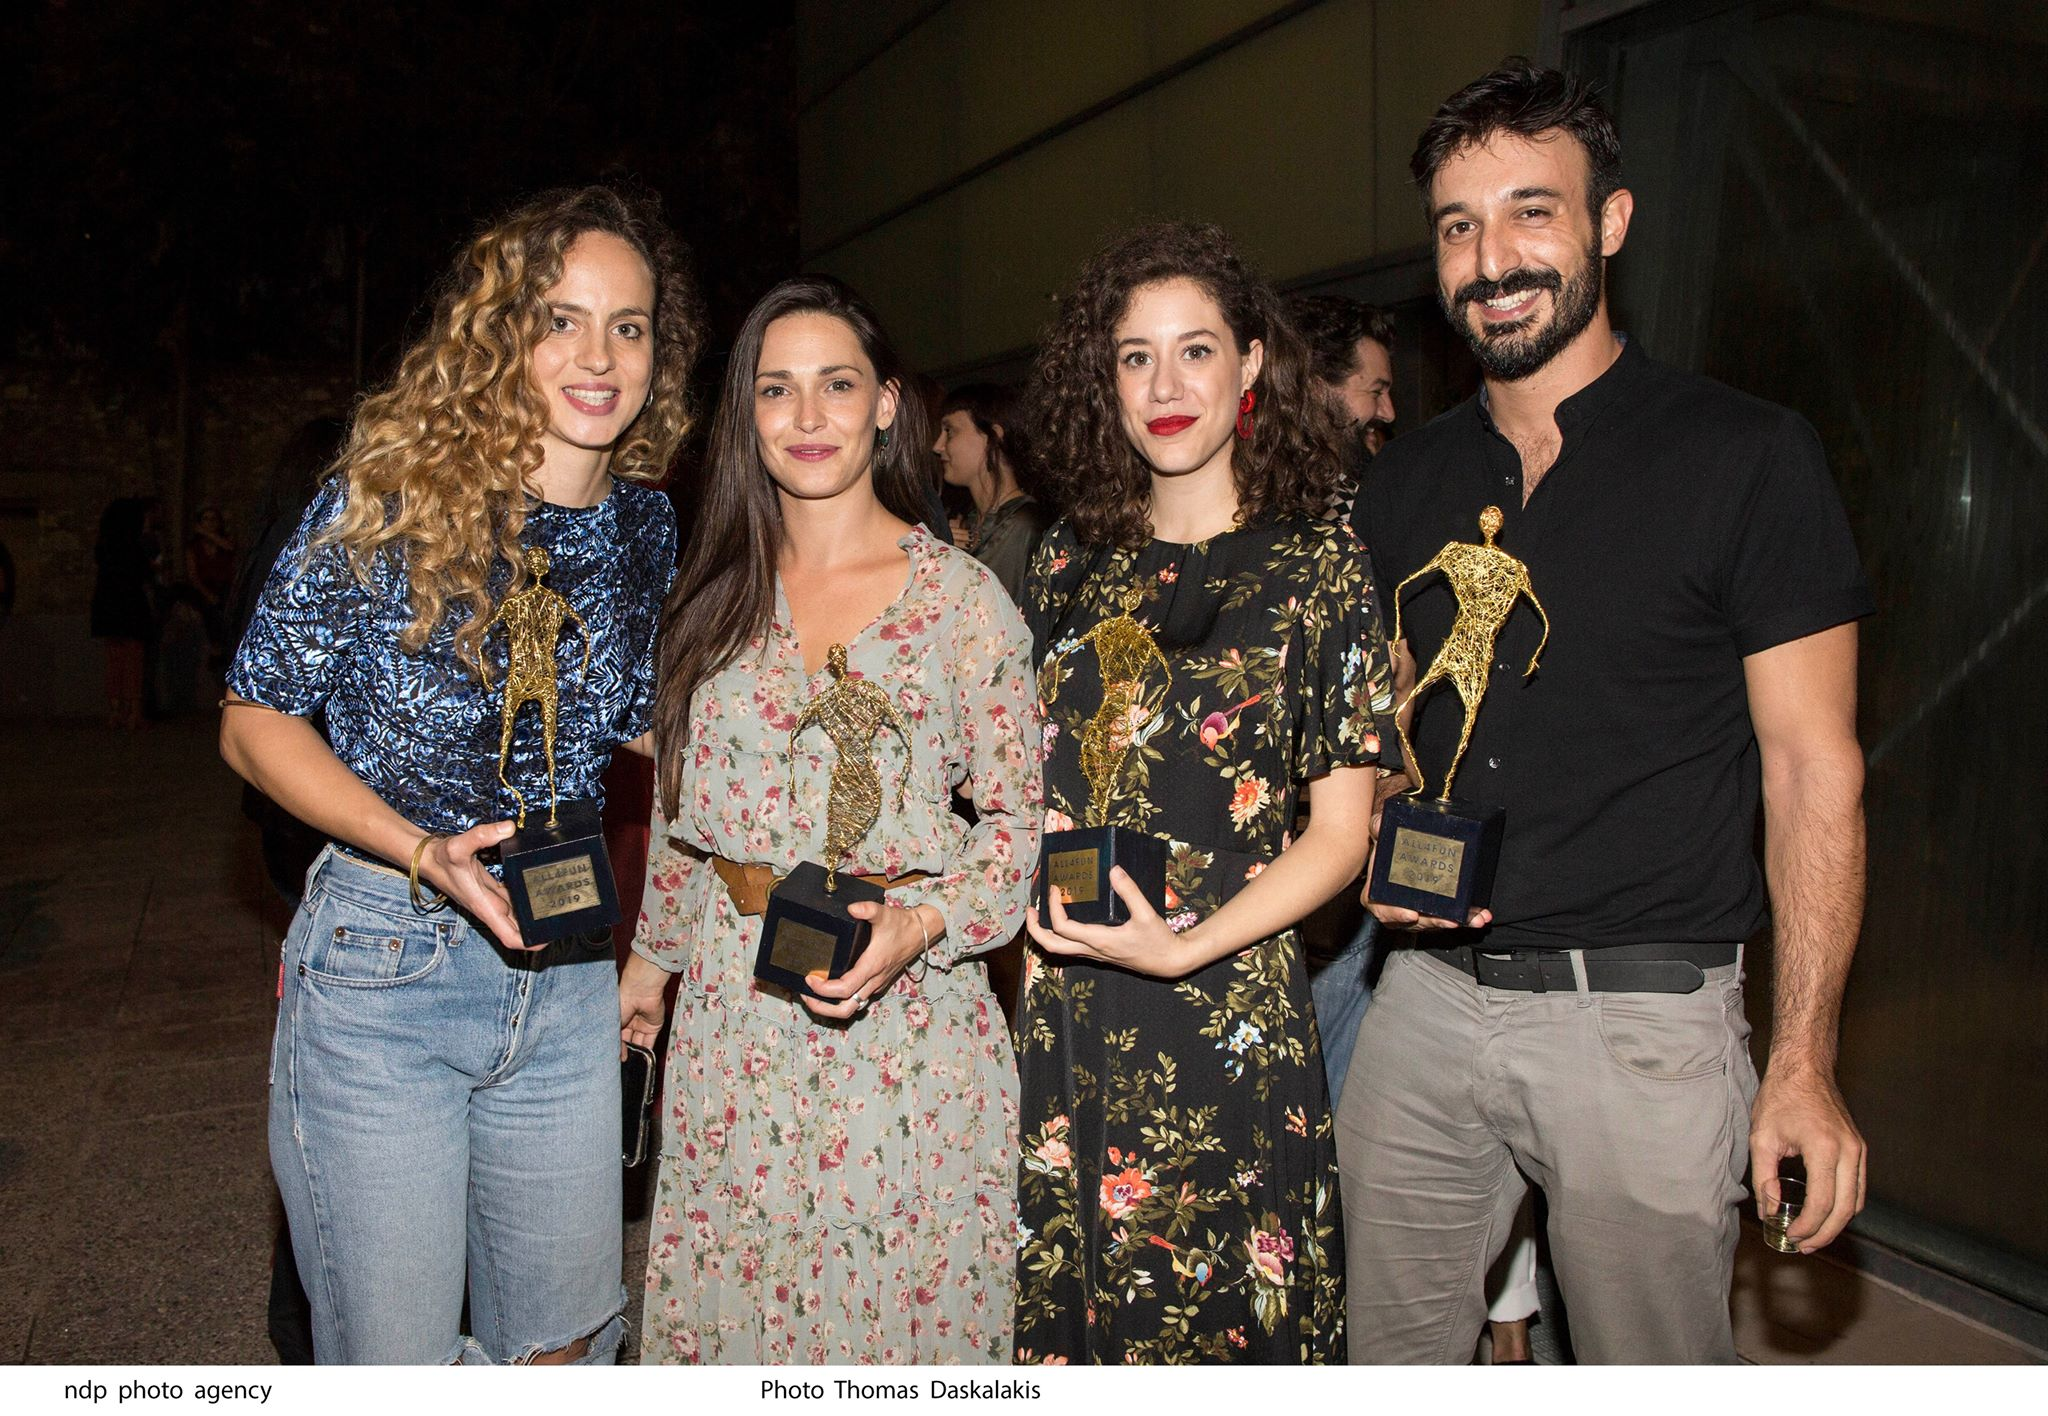 All4fun Awards 2019 (26).jpg